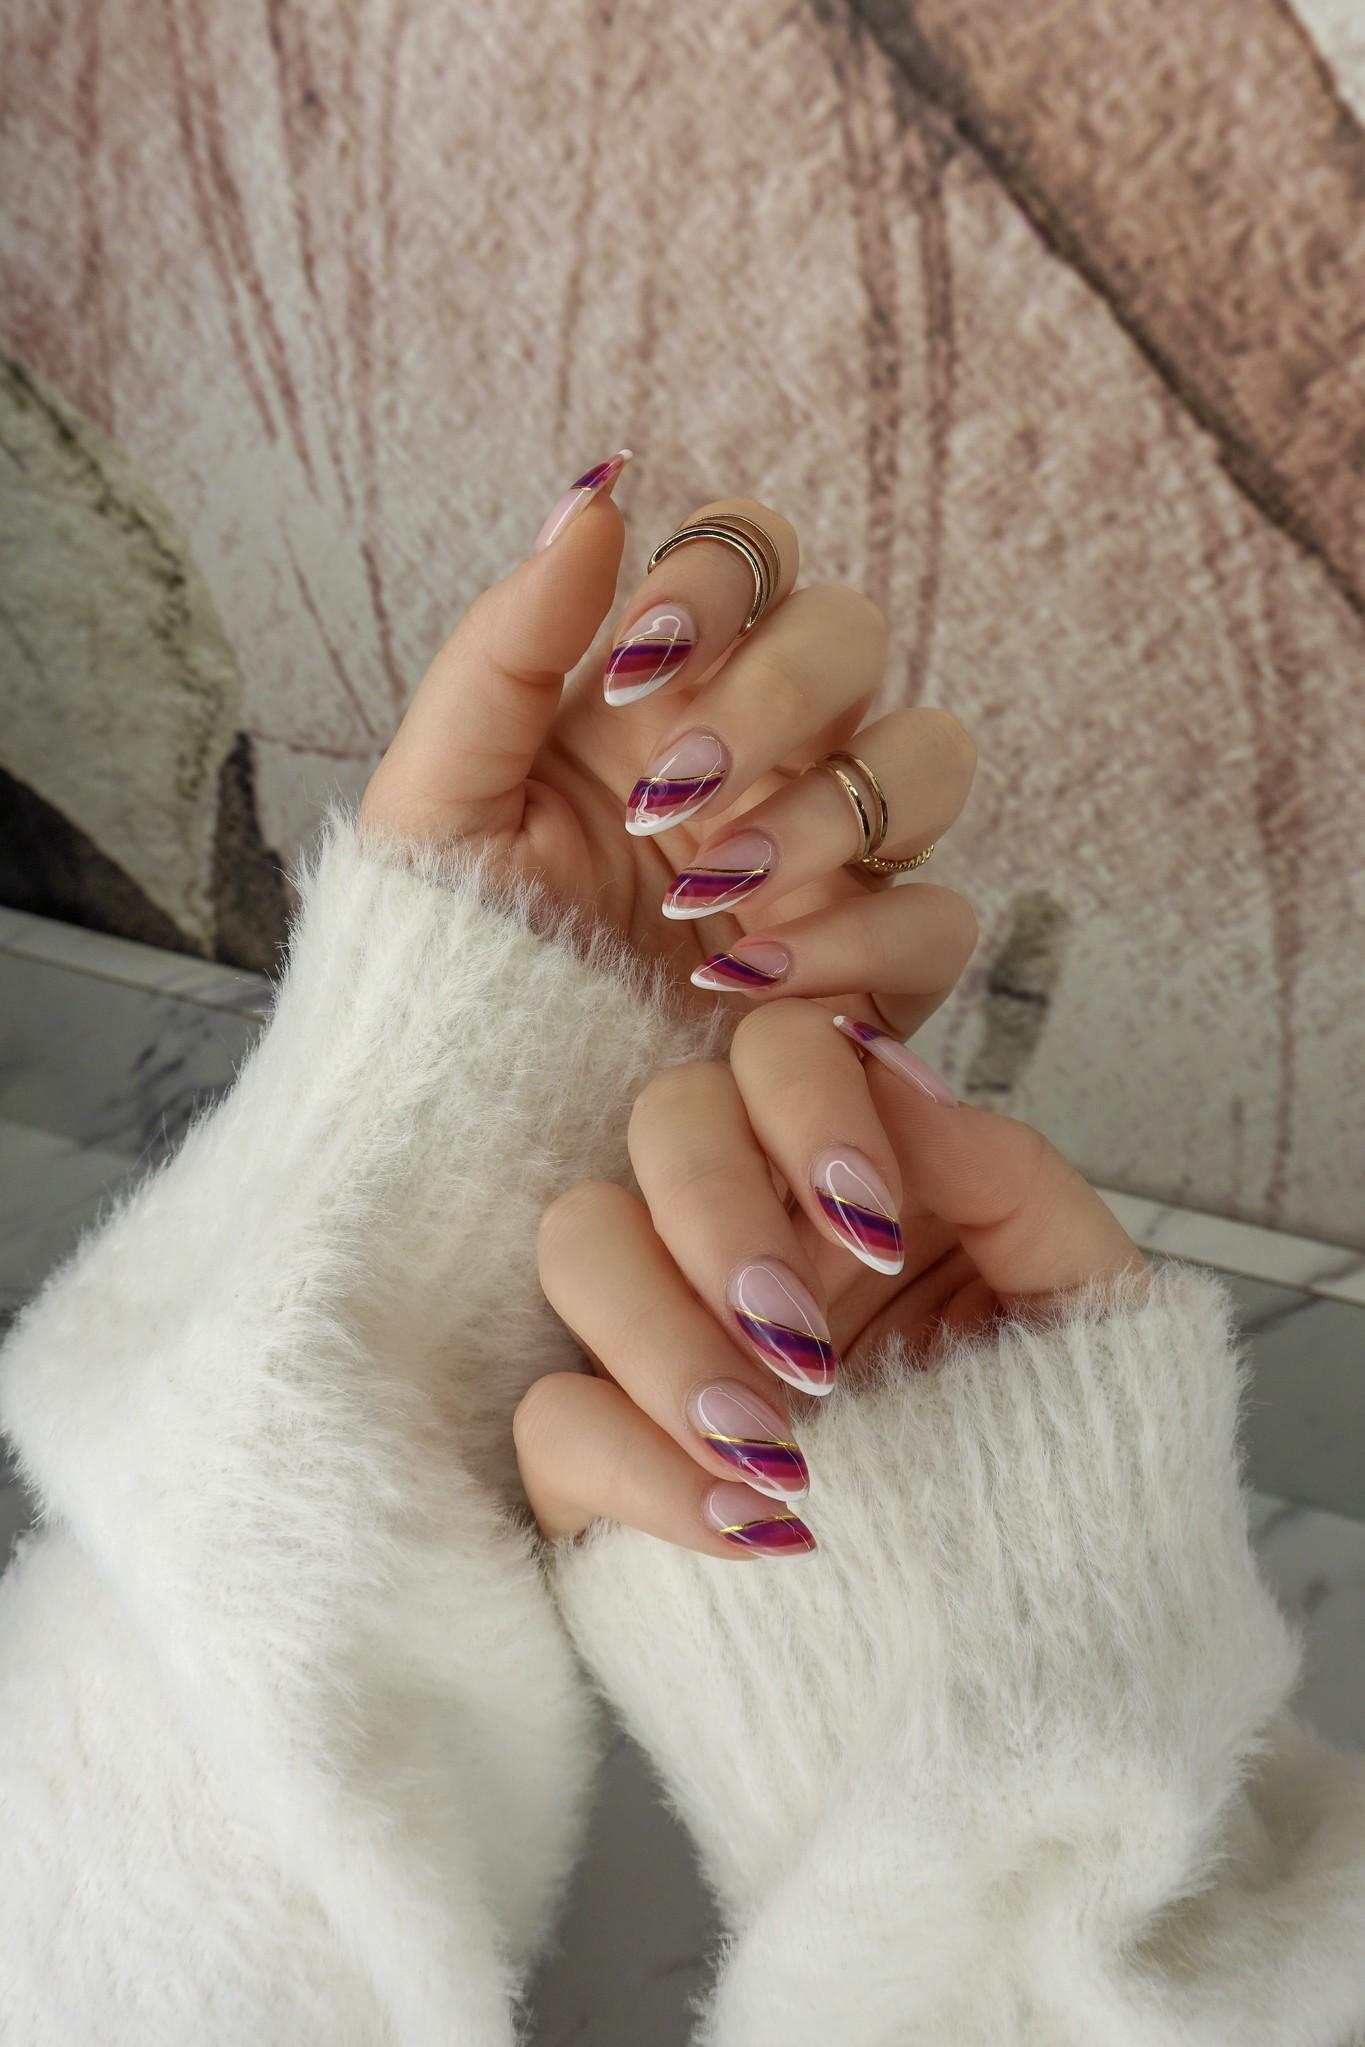 Fall French Twist Nails | Fall Rainbow Stripe Nails | Unique French Manicure | Fall Nails | Thanksgiving Nails | November Nails | Nail Ideas | Nail Art Inspiration | Nail Designs | Autumn Rainbow Mani | Gold Rings | Almond Shaped Nails